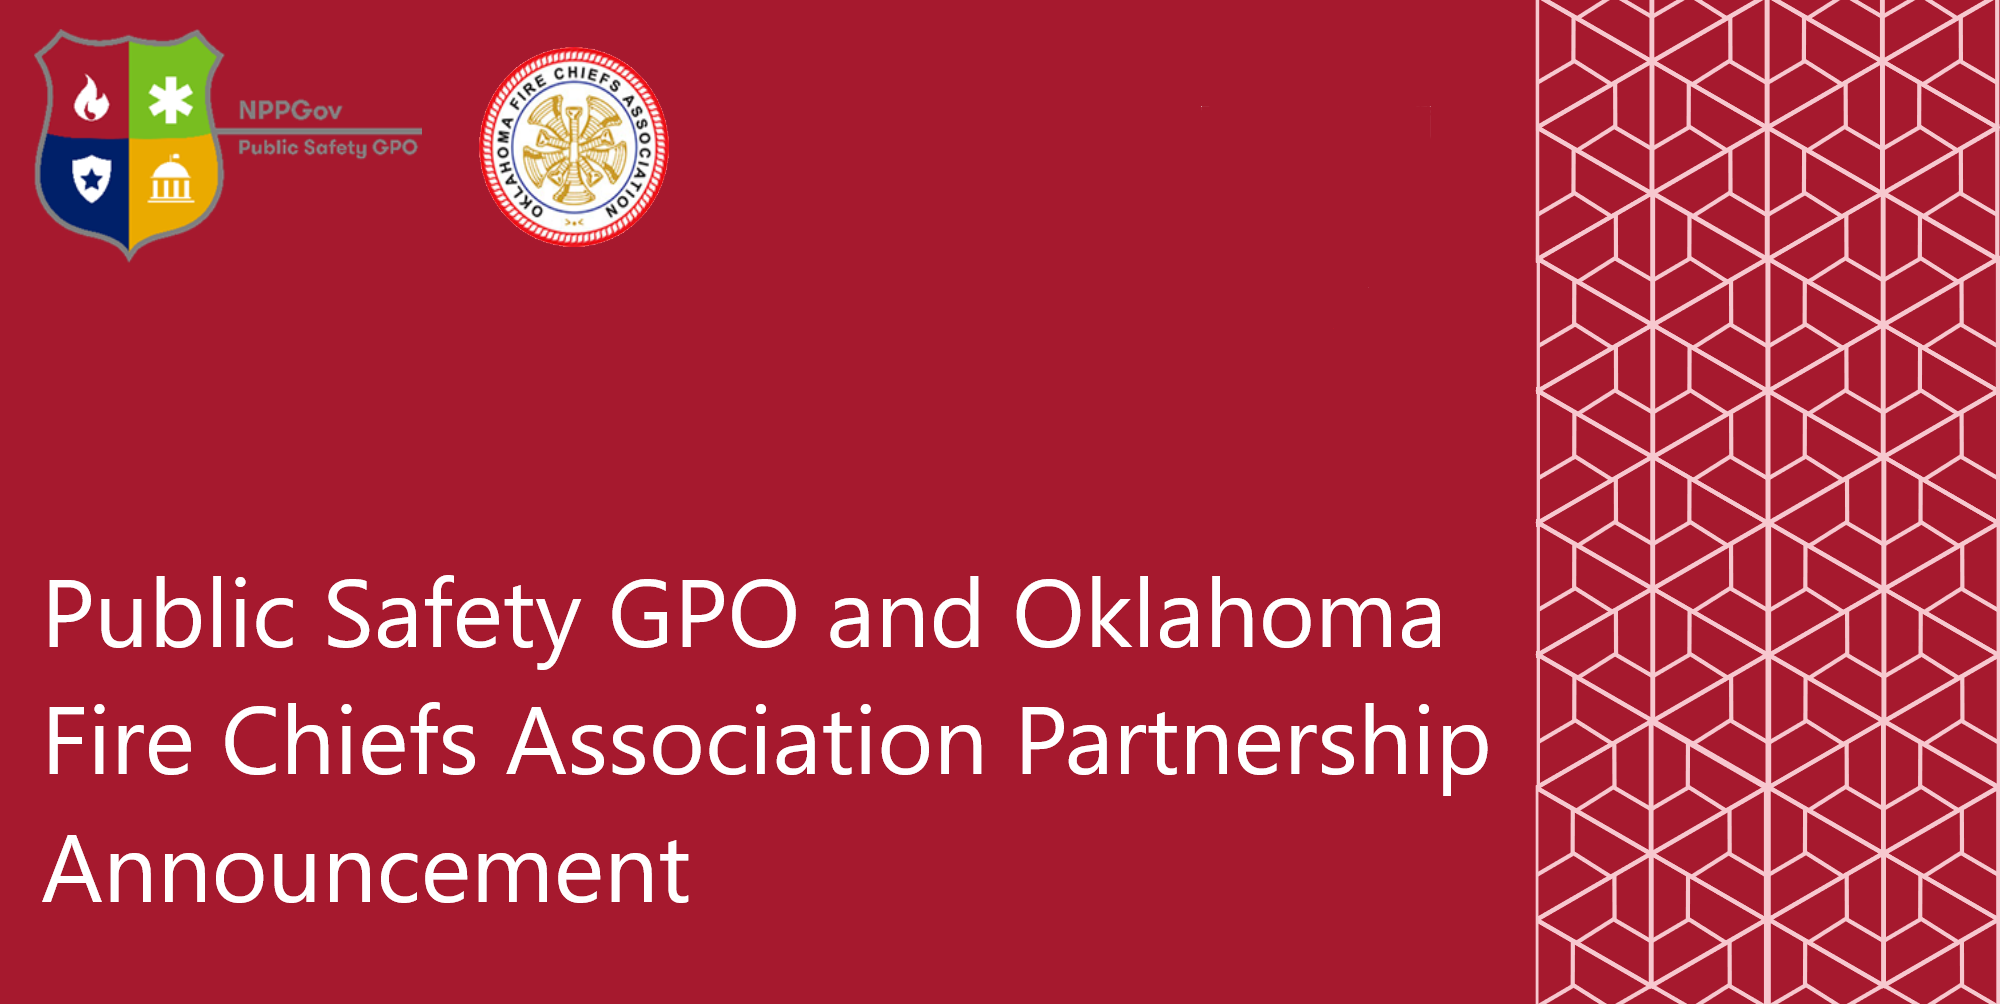 Oklahoma Fire Chiefs Partnership Announcement